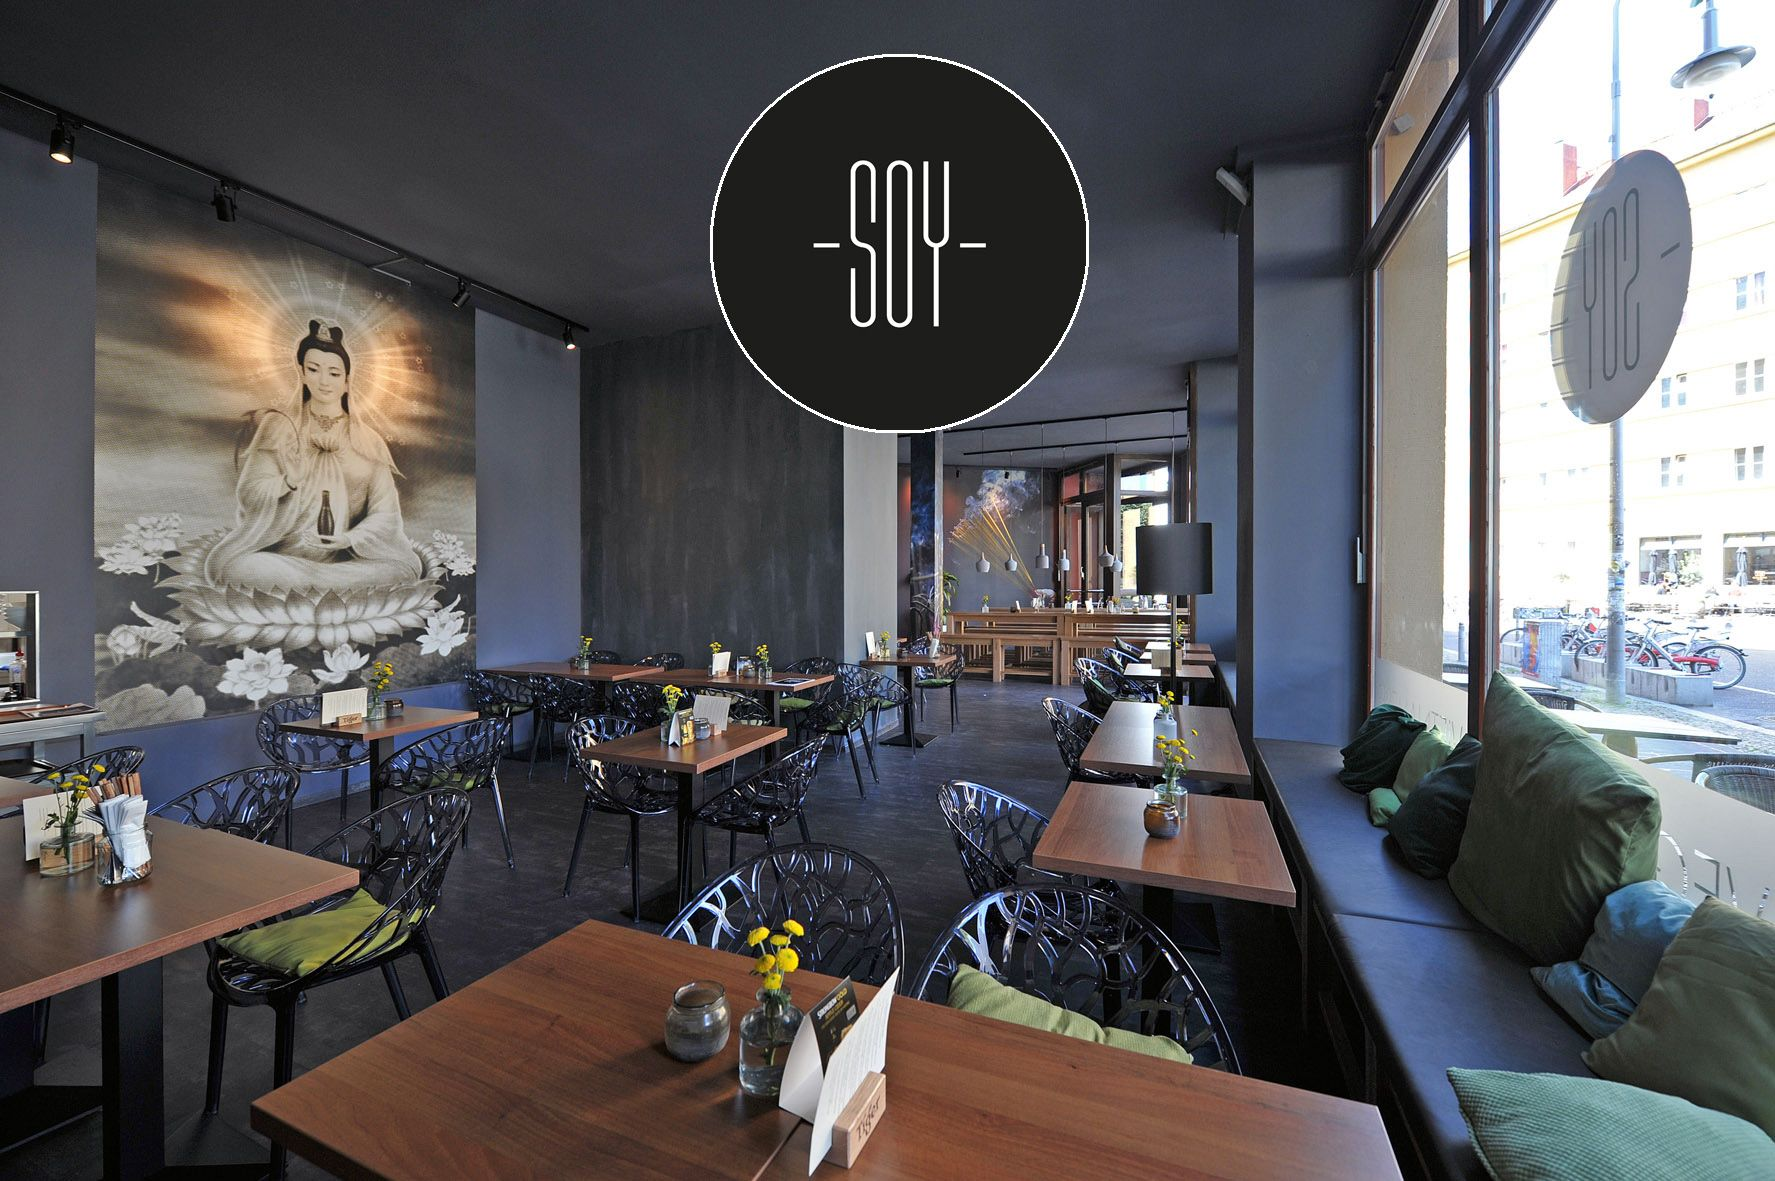 soy restaurant berlin veg restaurant vegan friendly restaurants berlin mitte luxemburg bakery